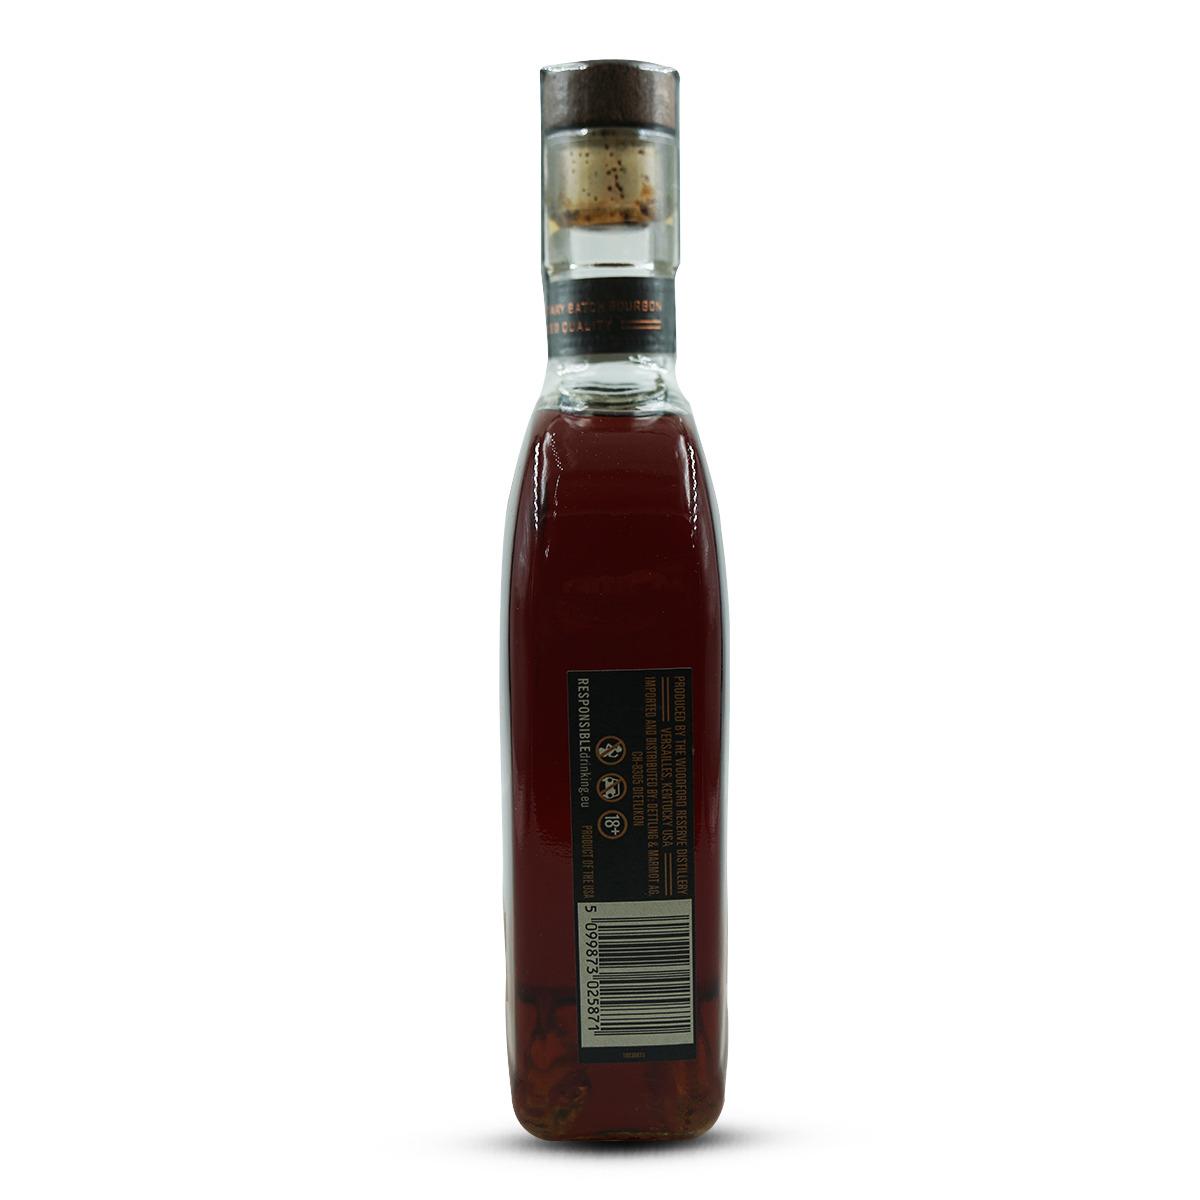 Woodford Reserve Kentucky Straight Bourbon Whiskey